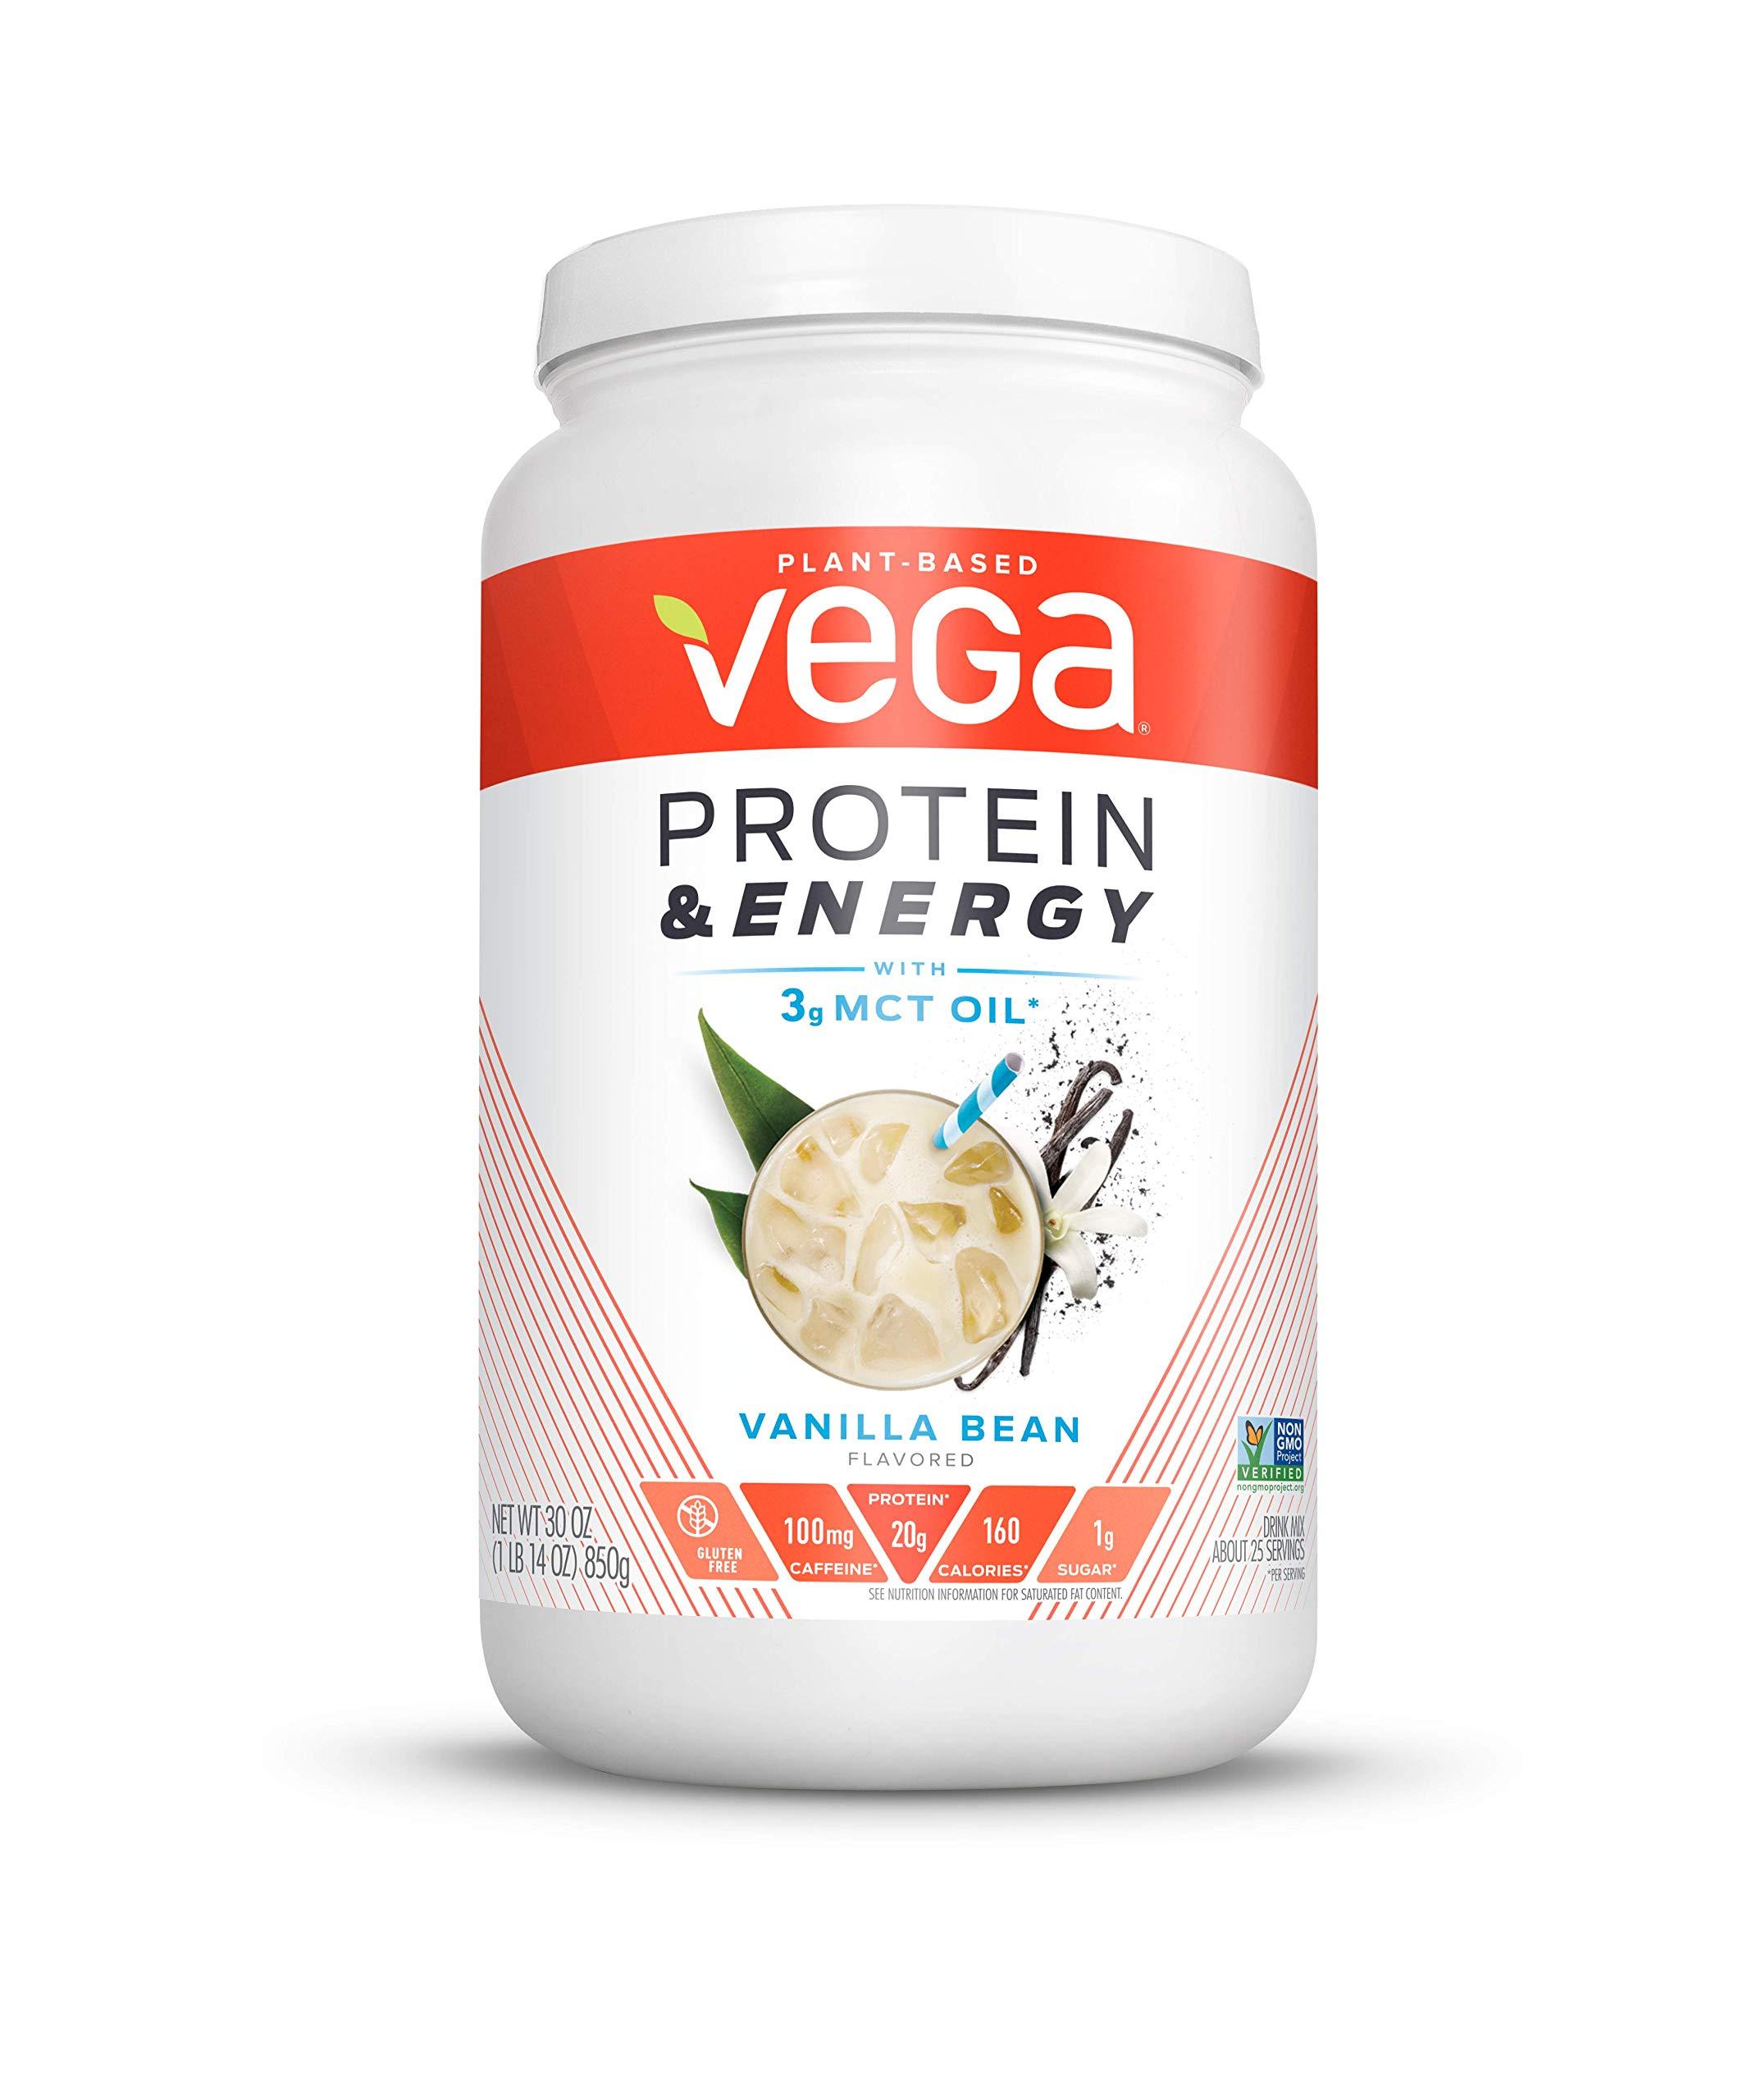 Vega Protein & Energy Vanilla Bean (25 Servings, 30 Ounce (1 Count)) - Plant Based Vegan Non Dairy Protein Powder, Gluten Free, Keto, MCT oil, Non GMO by VEGA